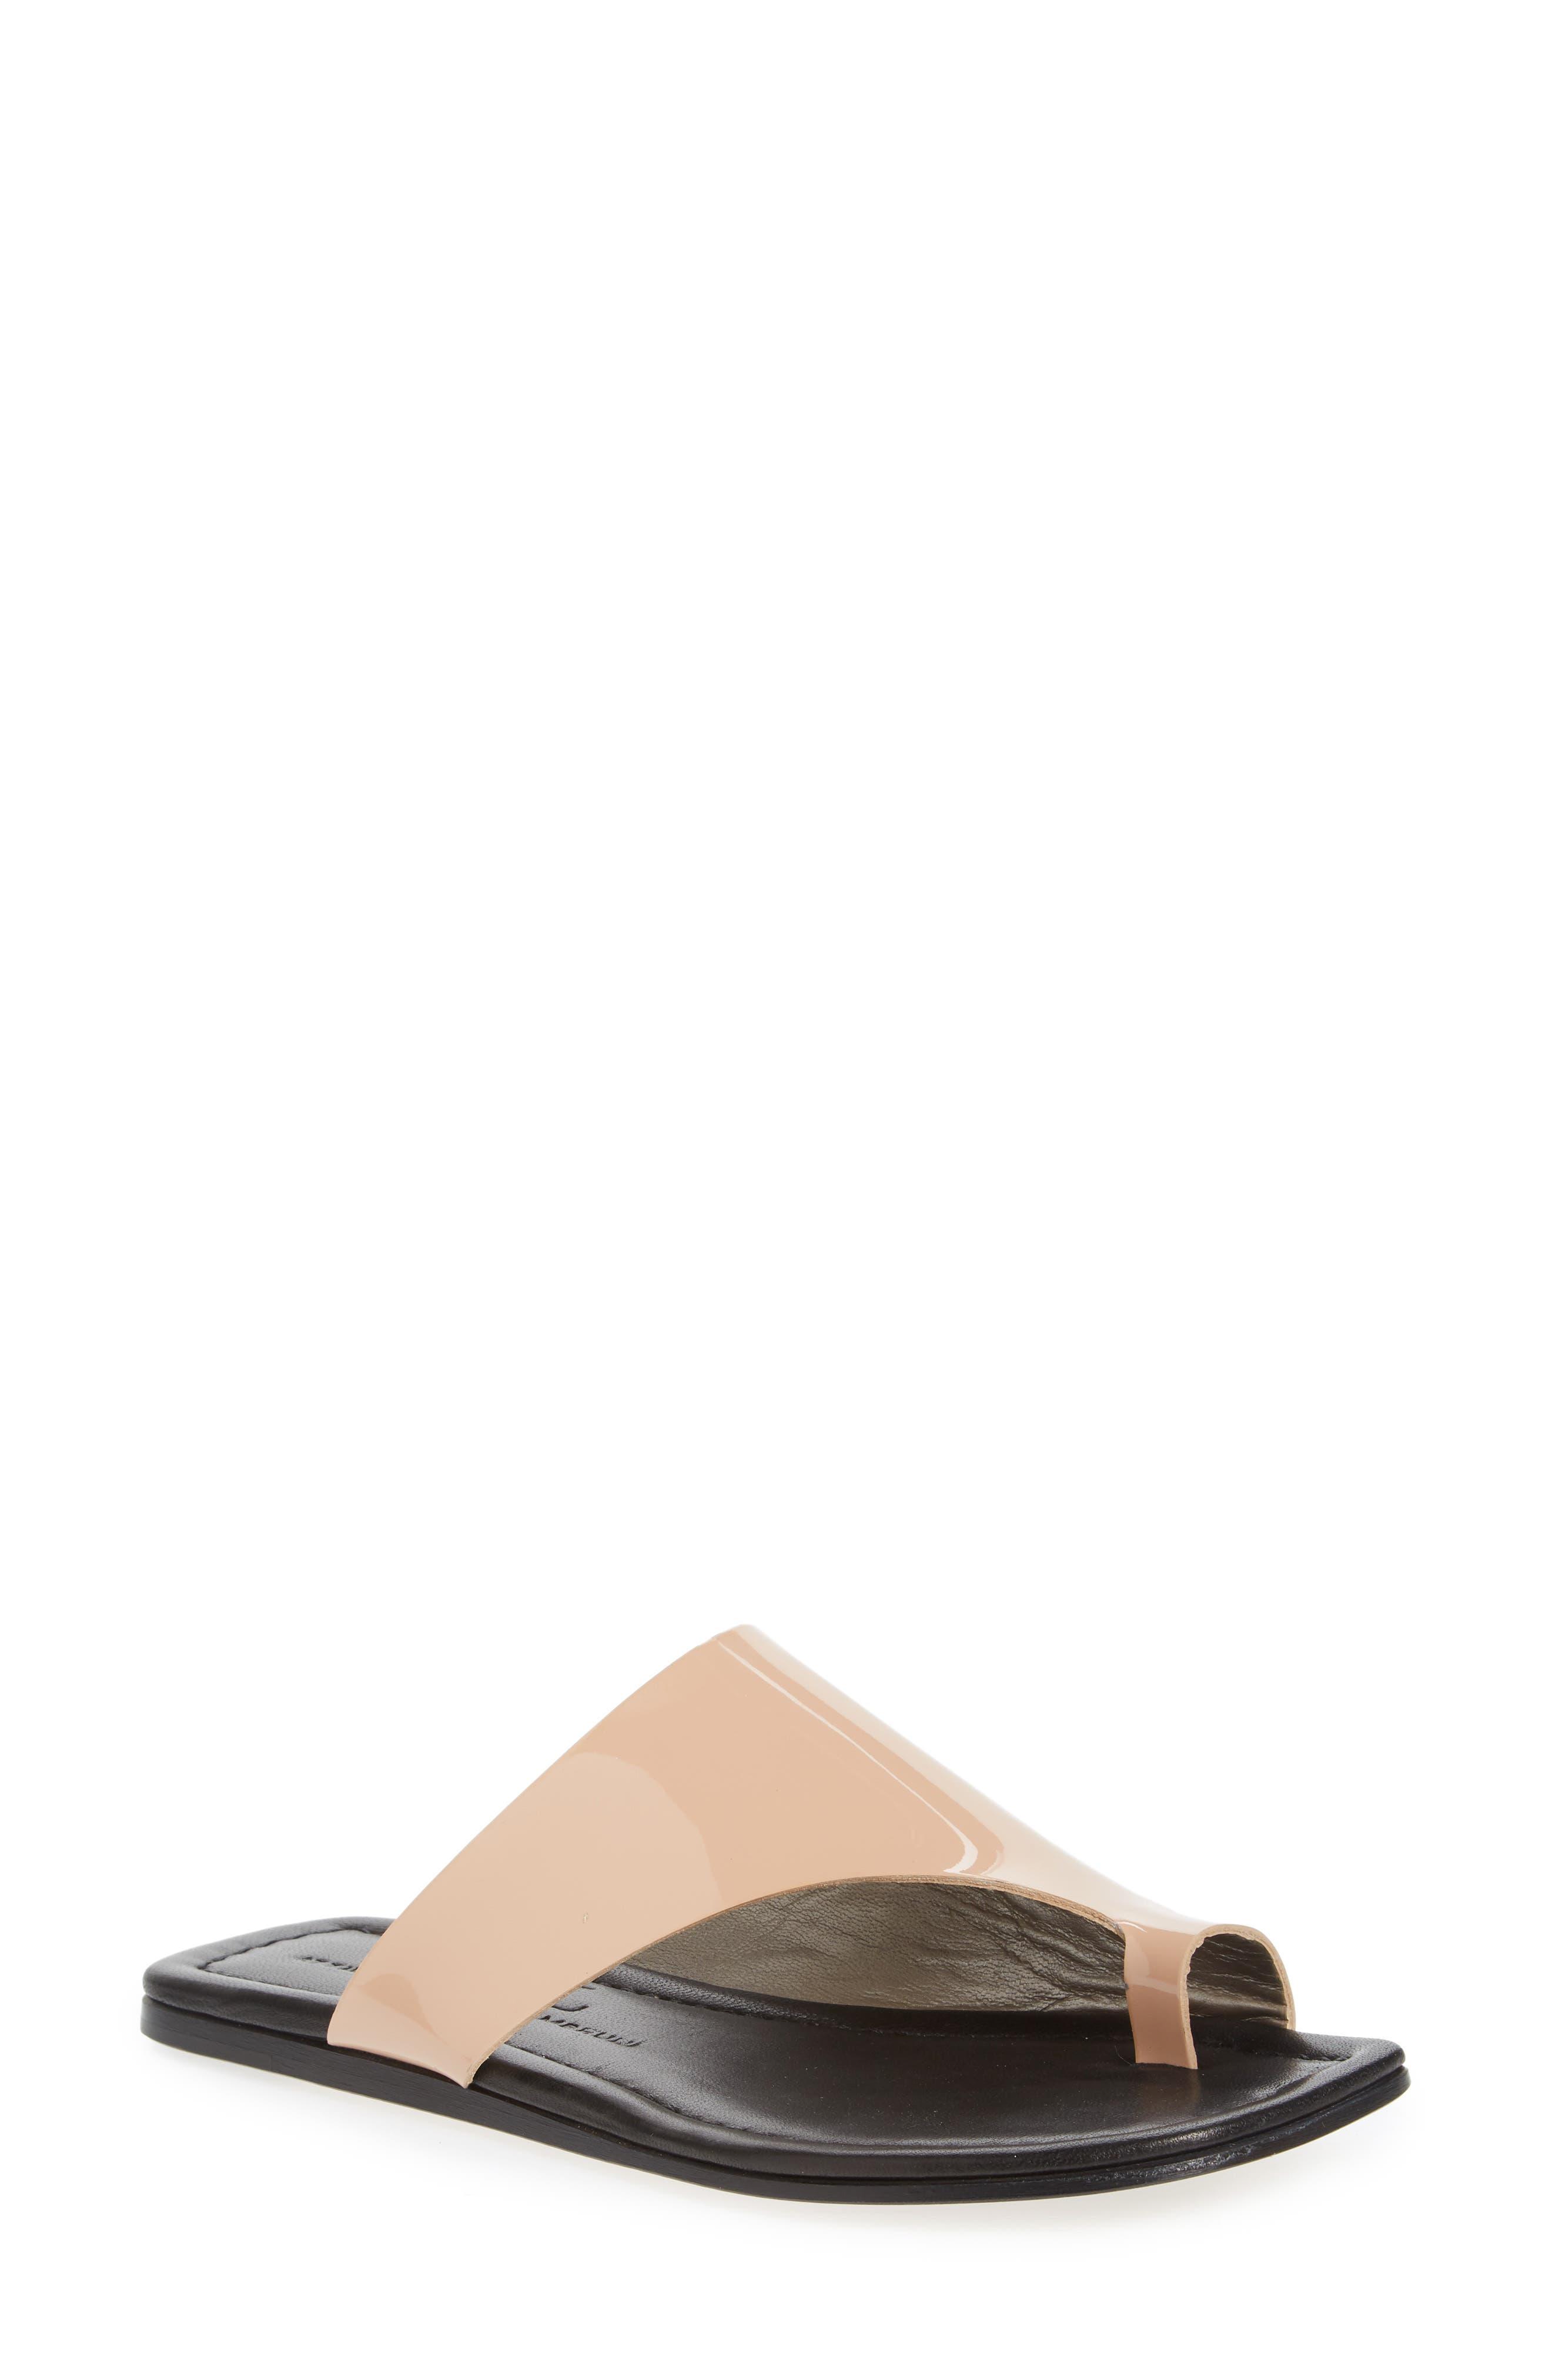 5f04b2d961b82 Agl Attilio Giusti Leombruni Asymmetrical Toe Thong Sandal In Nude Patent